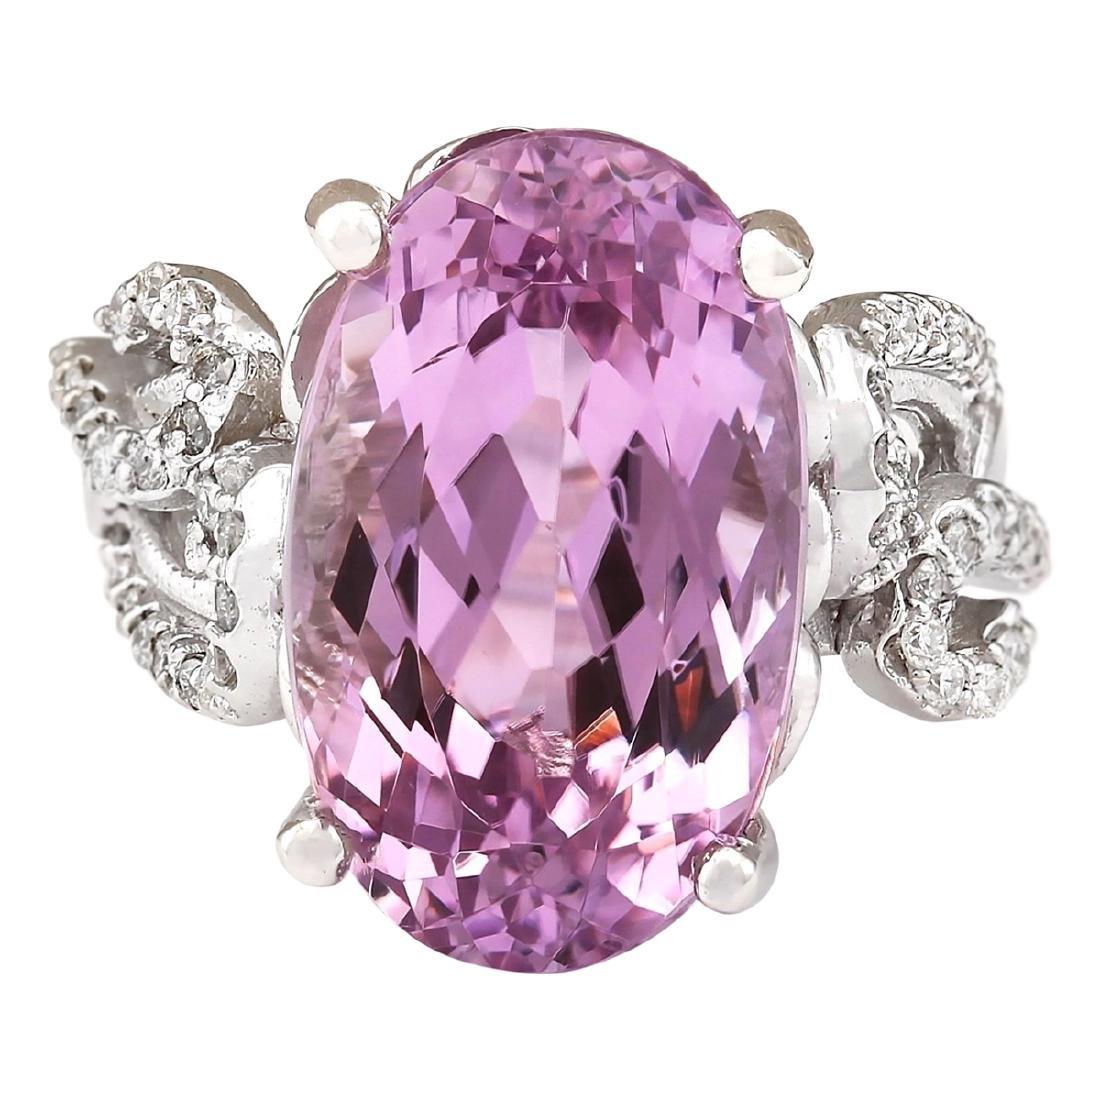 13.86 CTW Natural Kunzite And Diamond Ring In 18K White